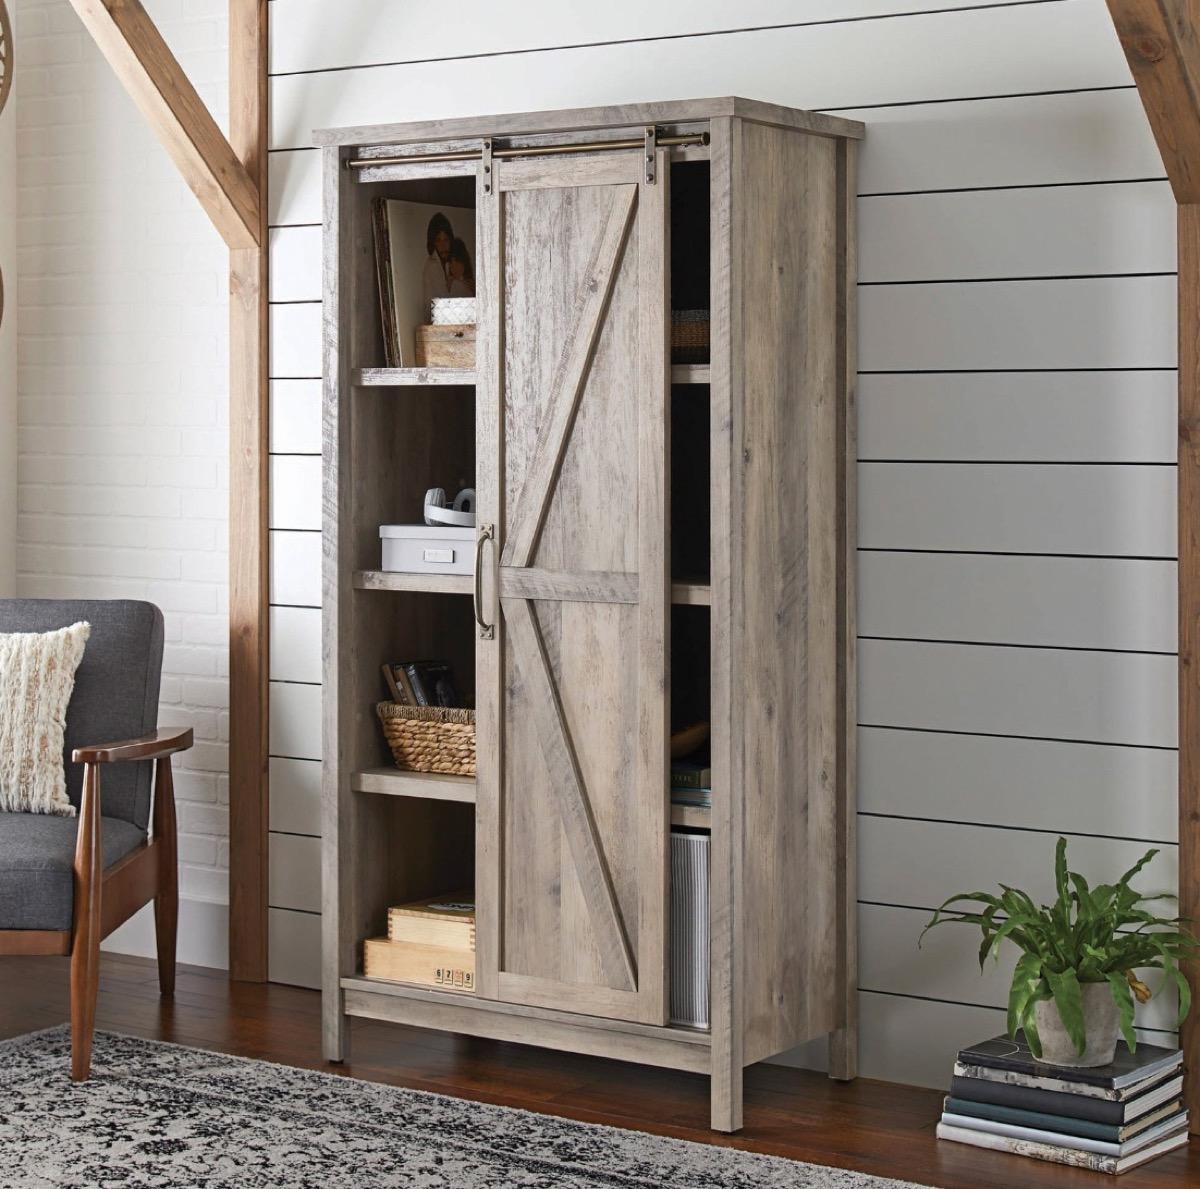 Walmart Farmhouse Bookshelf Storage Furniture